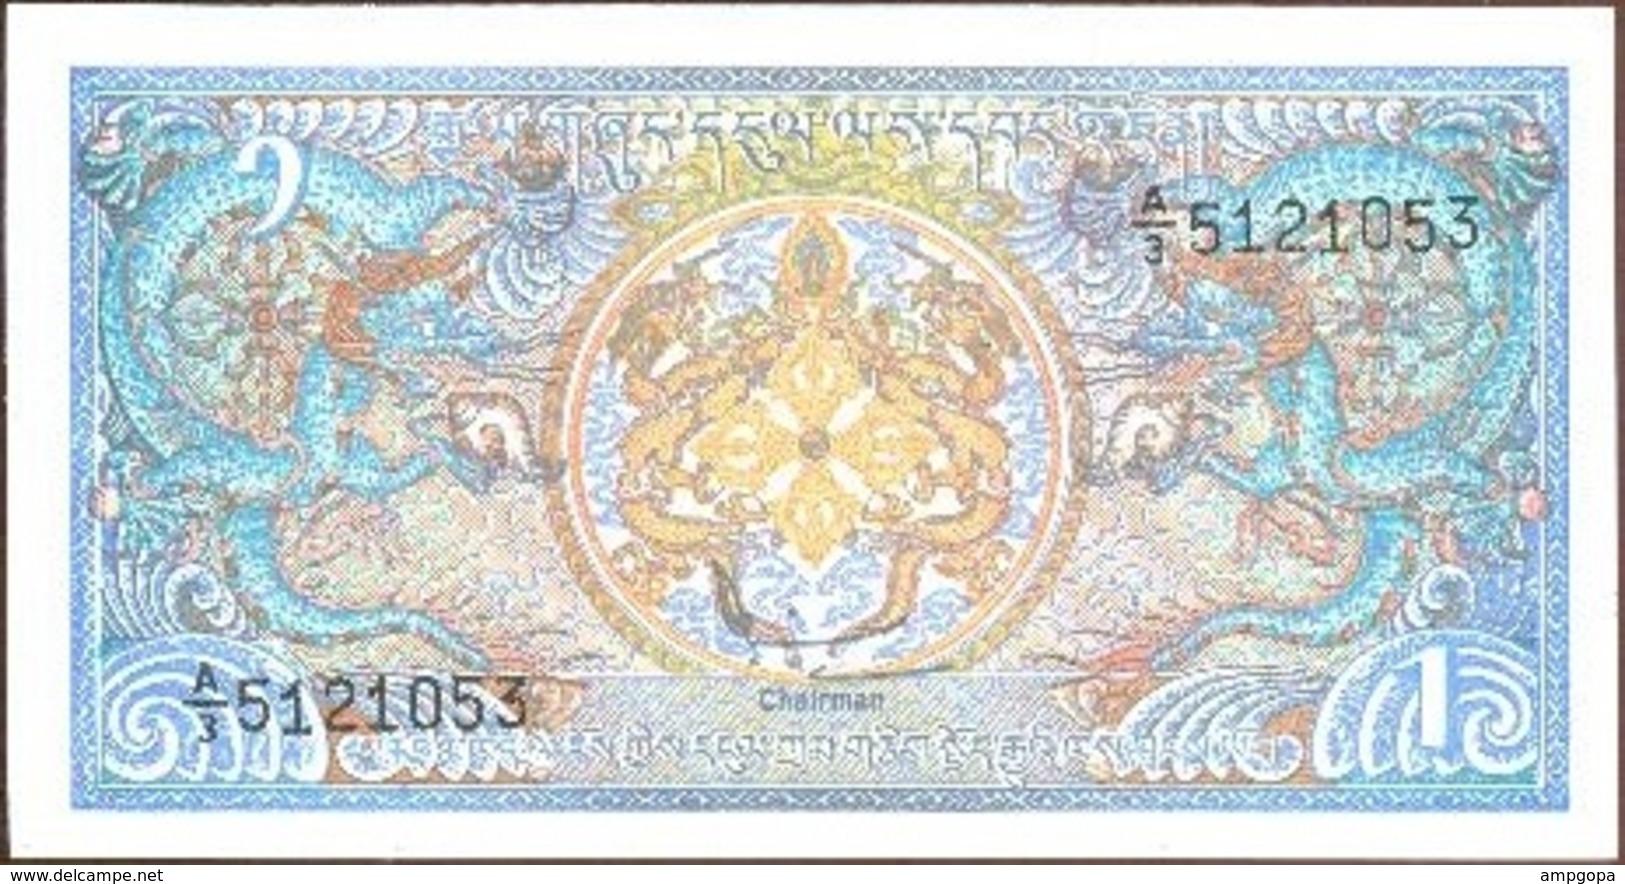 Bután - Bhutan 1 Ngultrum 1990 Pk 12 B UNC - Bhután